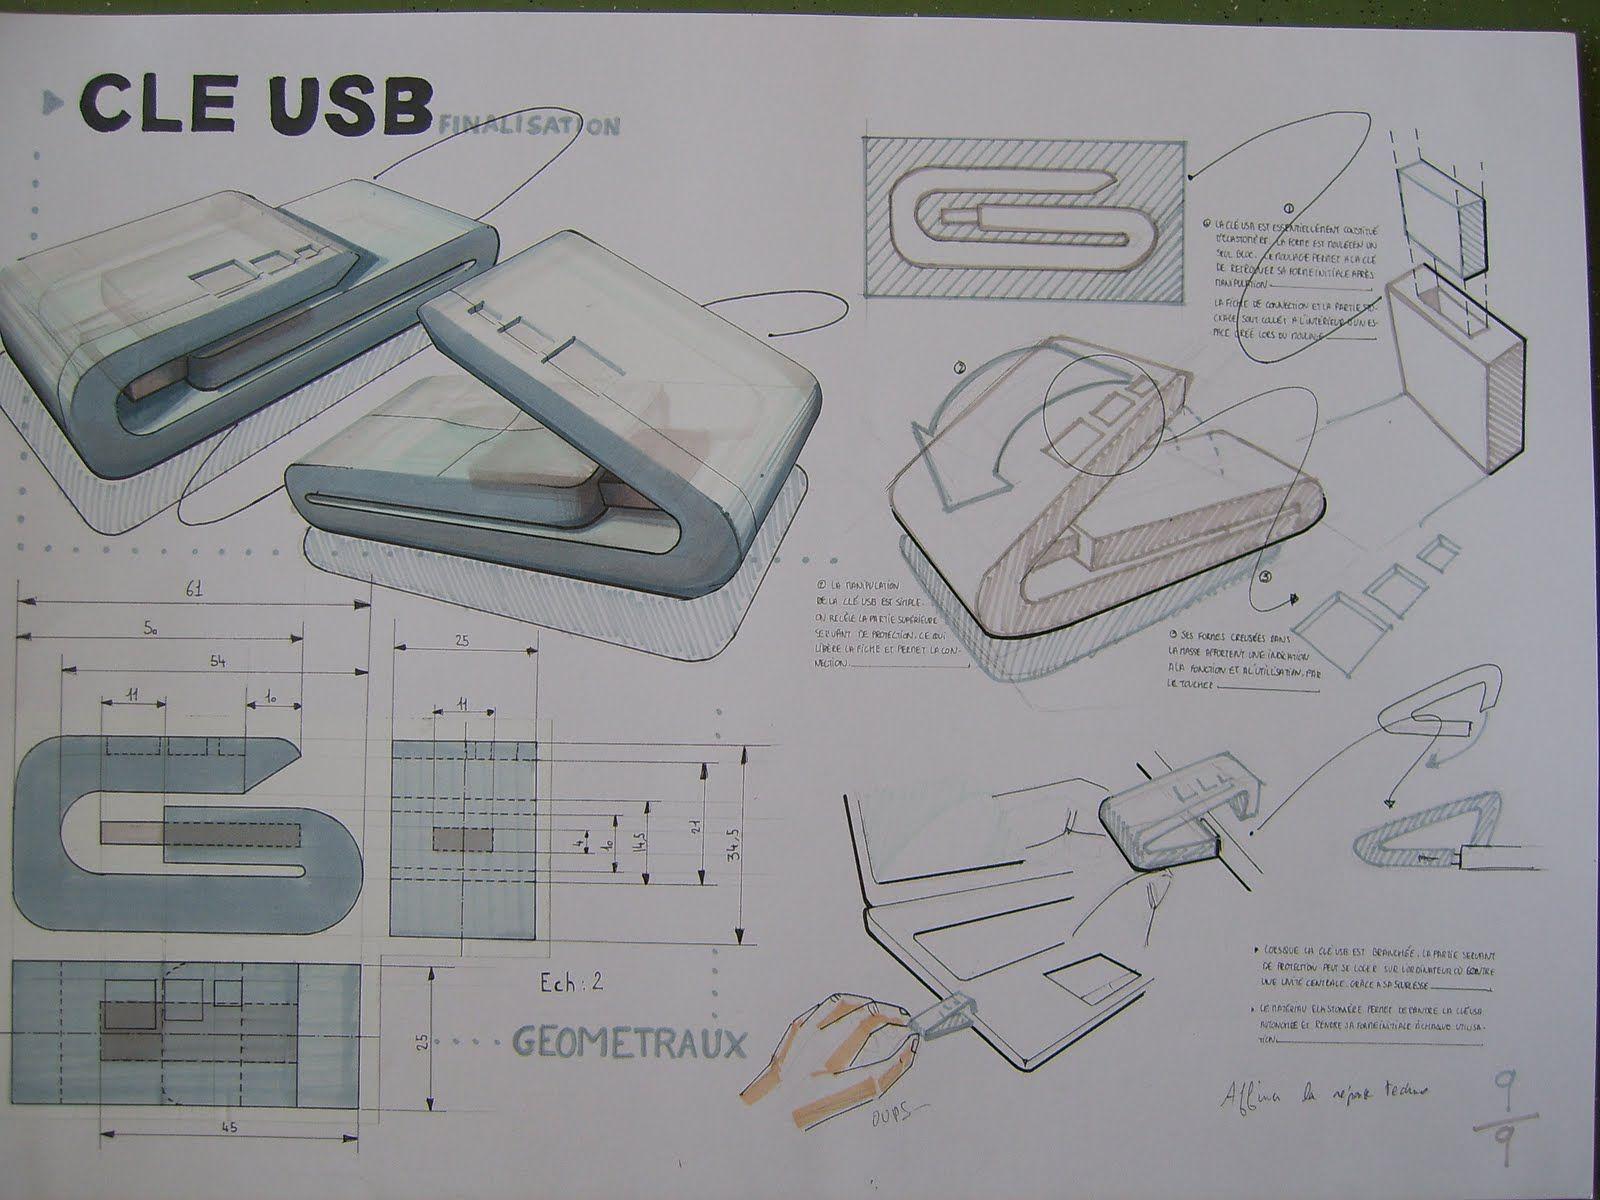 Pôle Design RecherchesDraw JeanperrinmarseilleAnalyse RecherchesDraw Pôle JeanperrinmarseilleAnalyse Pôle Design Design F1JT5cluK3